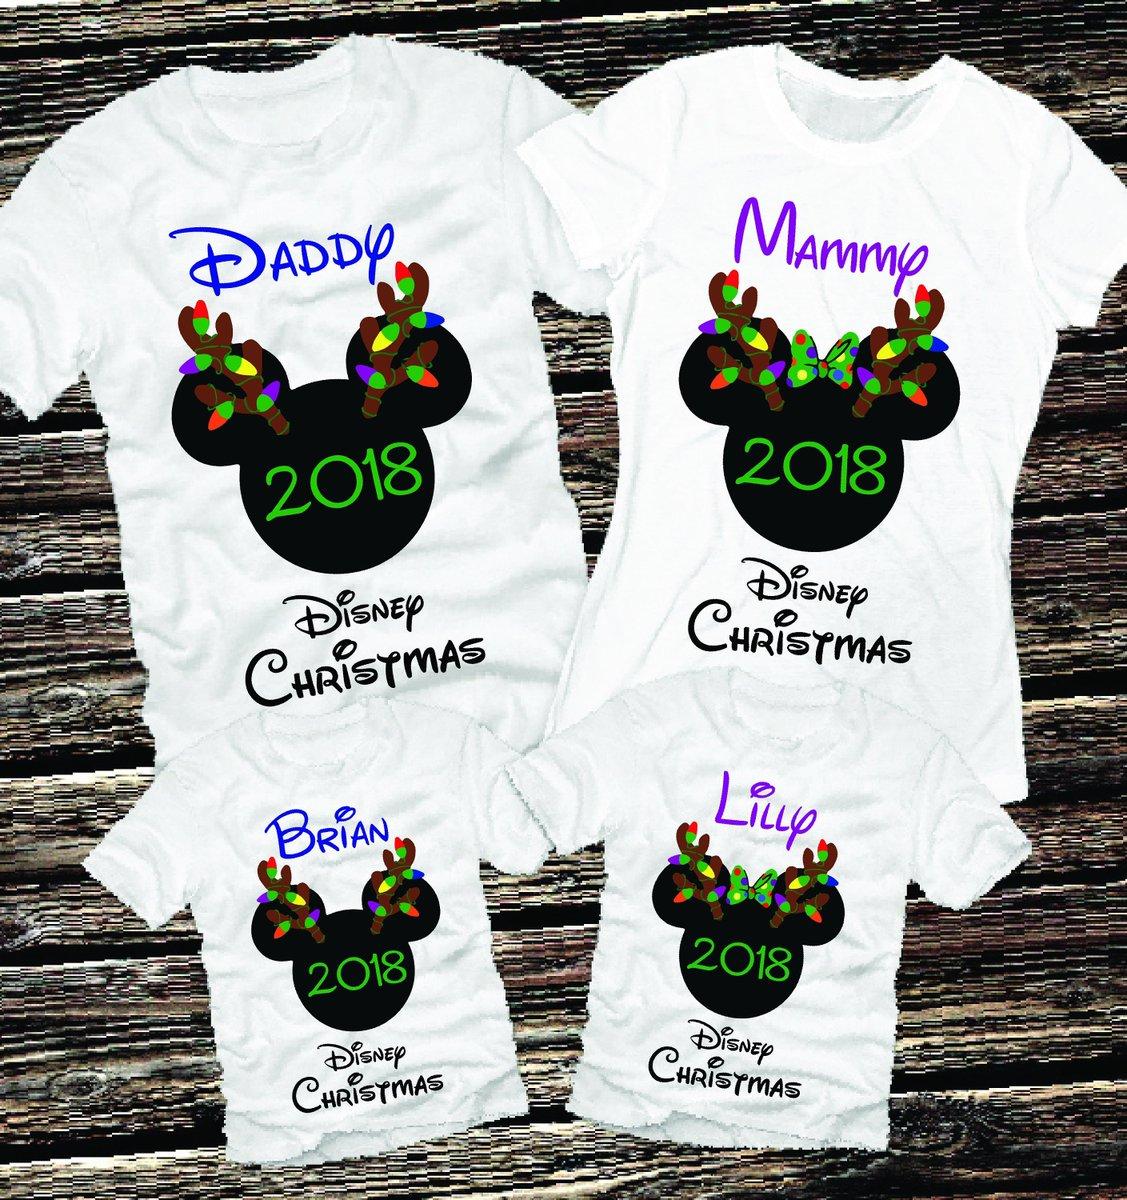 4dd95f1fd0595 ... Christmas shirts Mickey Head Christmas Shirts 2018 Family Shirts Disney  Vacation Disney Family Shirts Disney Christmas Family shirts ...